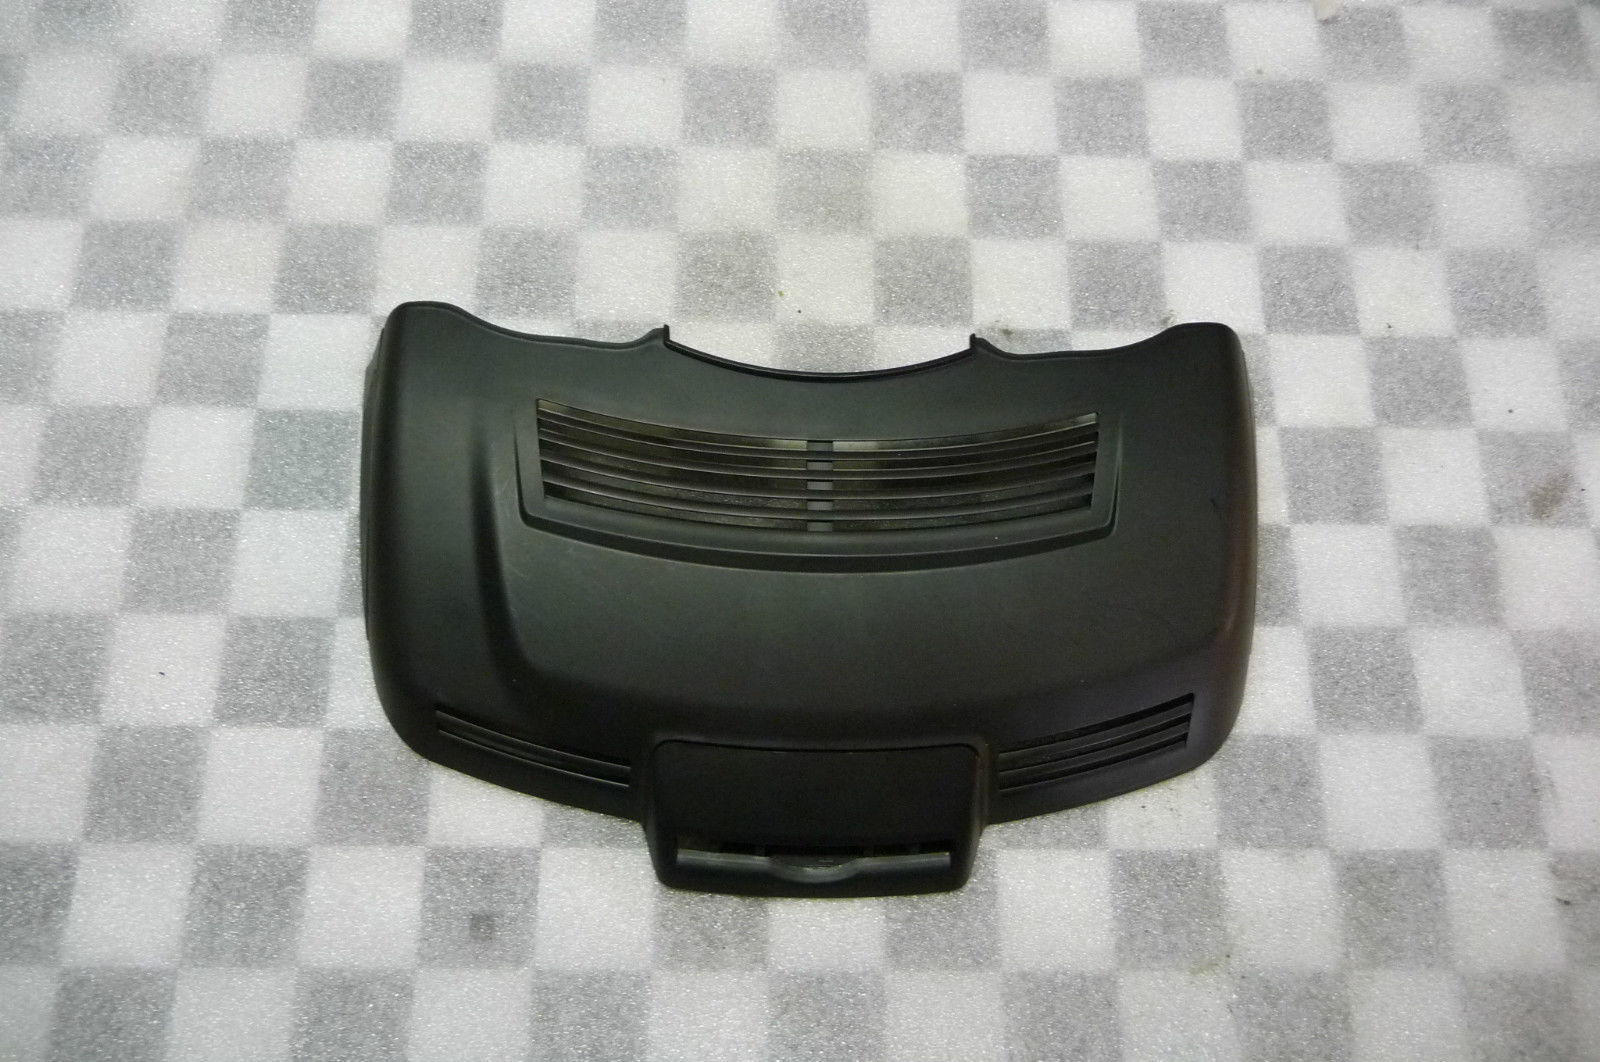 2010 2011 2012 2013 Mercedes Benz W221 S Class S350 S550 S63 AMG Rain Sensor Cover Sun Visor Black 2218211736 OEM OE